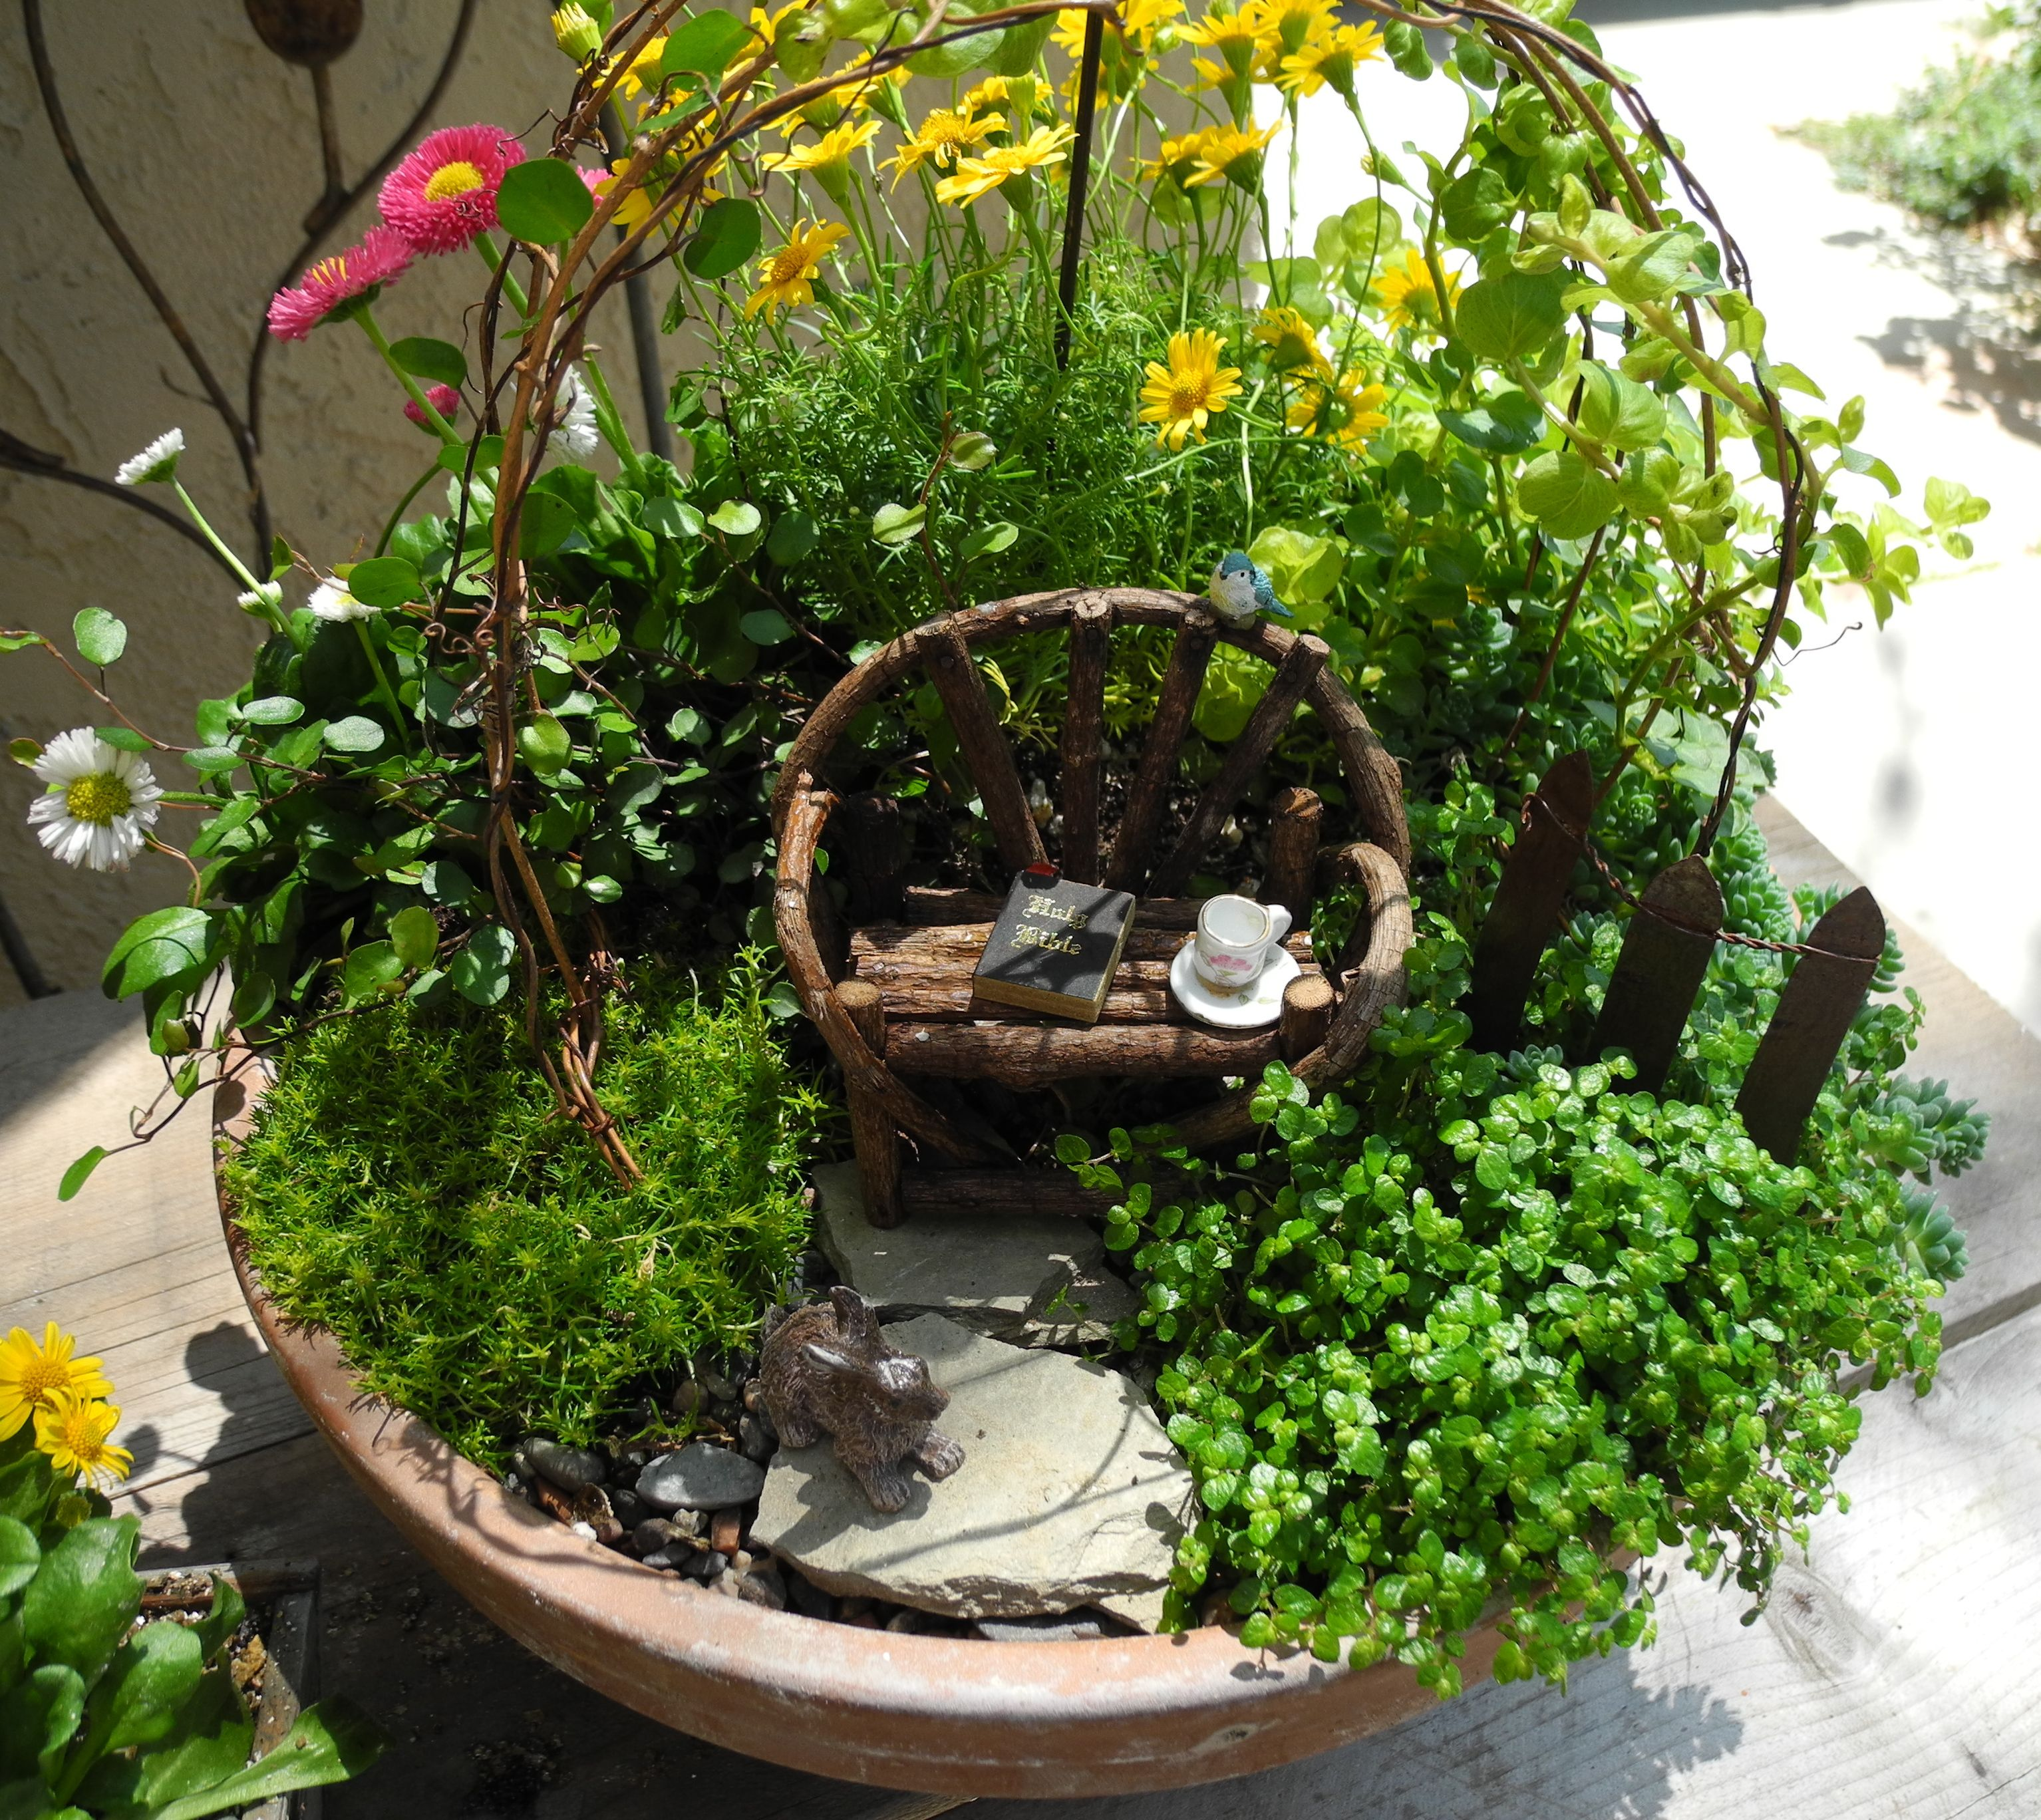 sweet little garden for your soul.